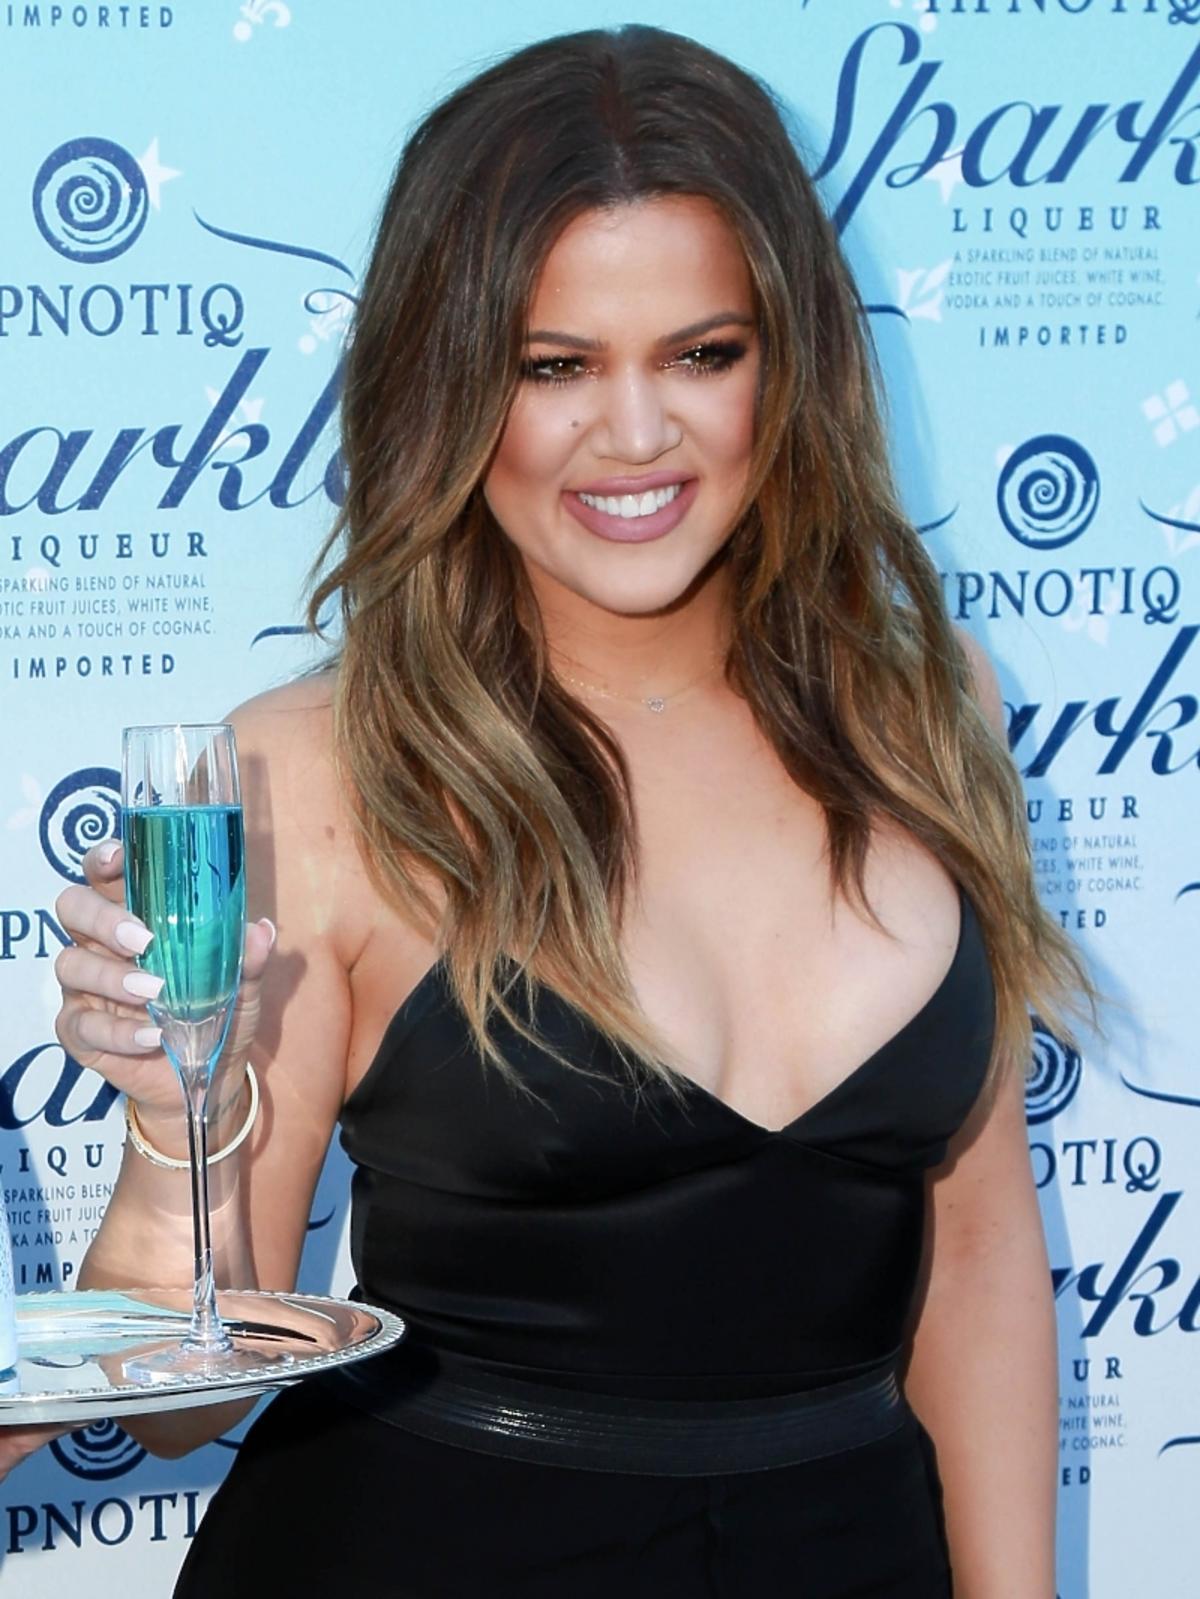 Khloe Kardashian promuje szampana HPNOTIQ Sparkle w Beverly Hills